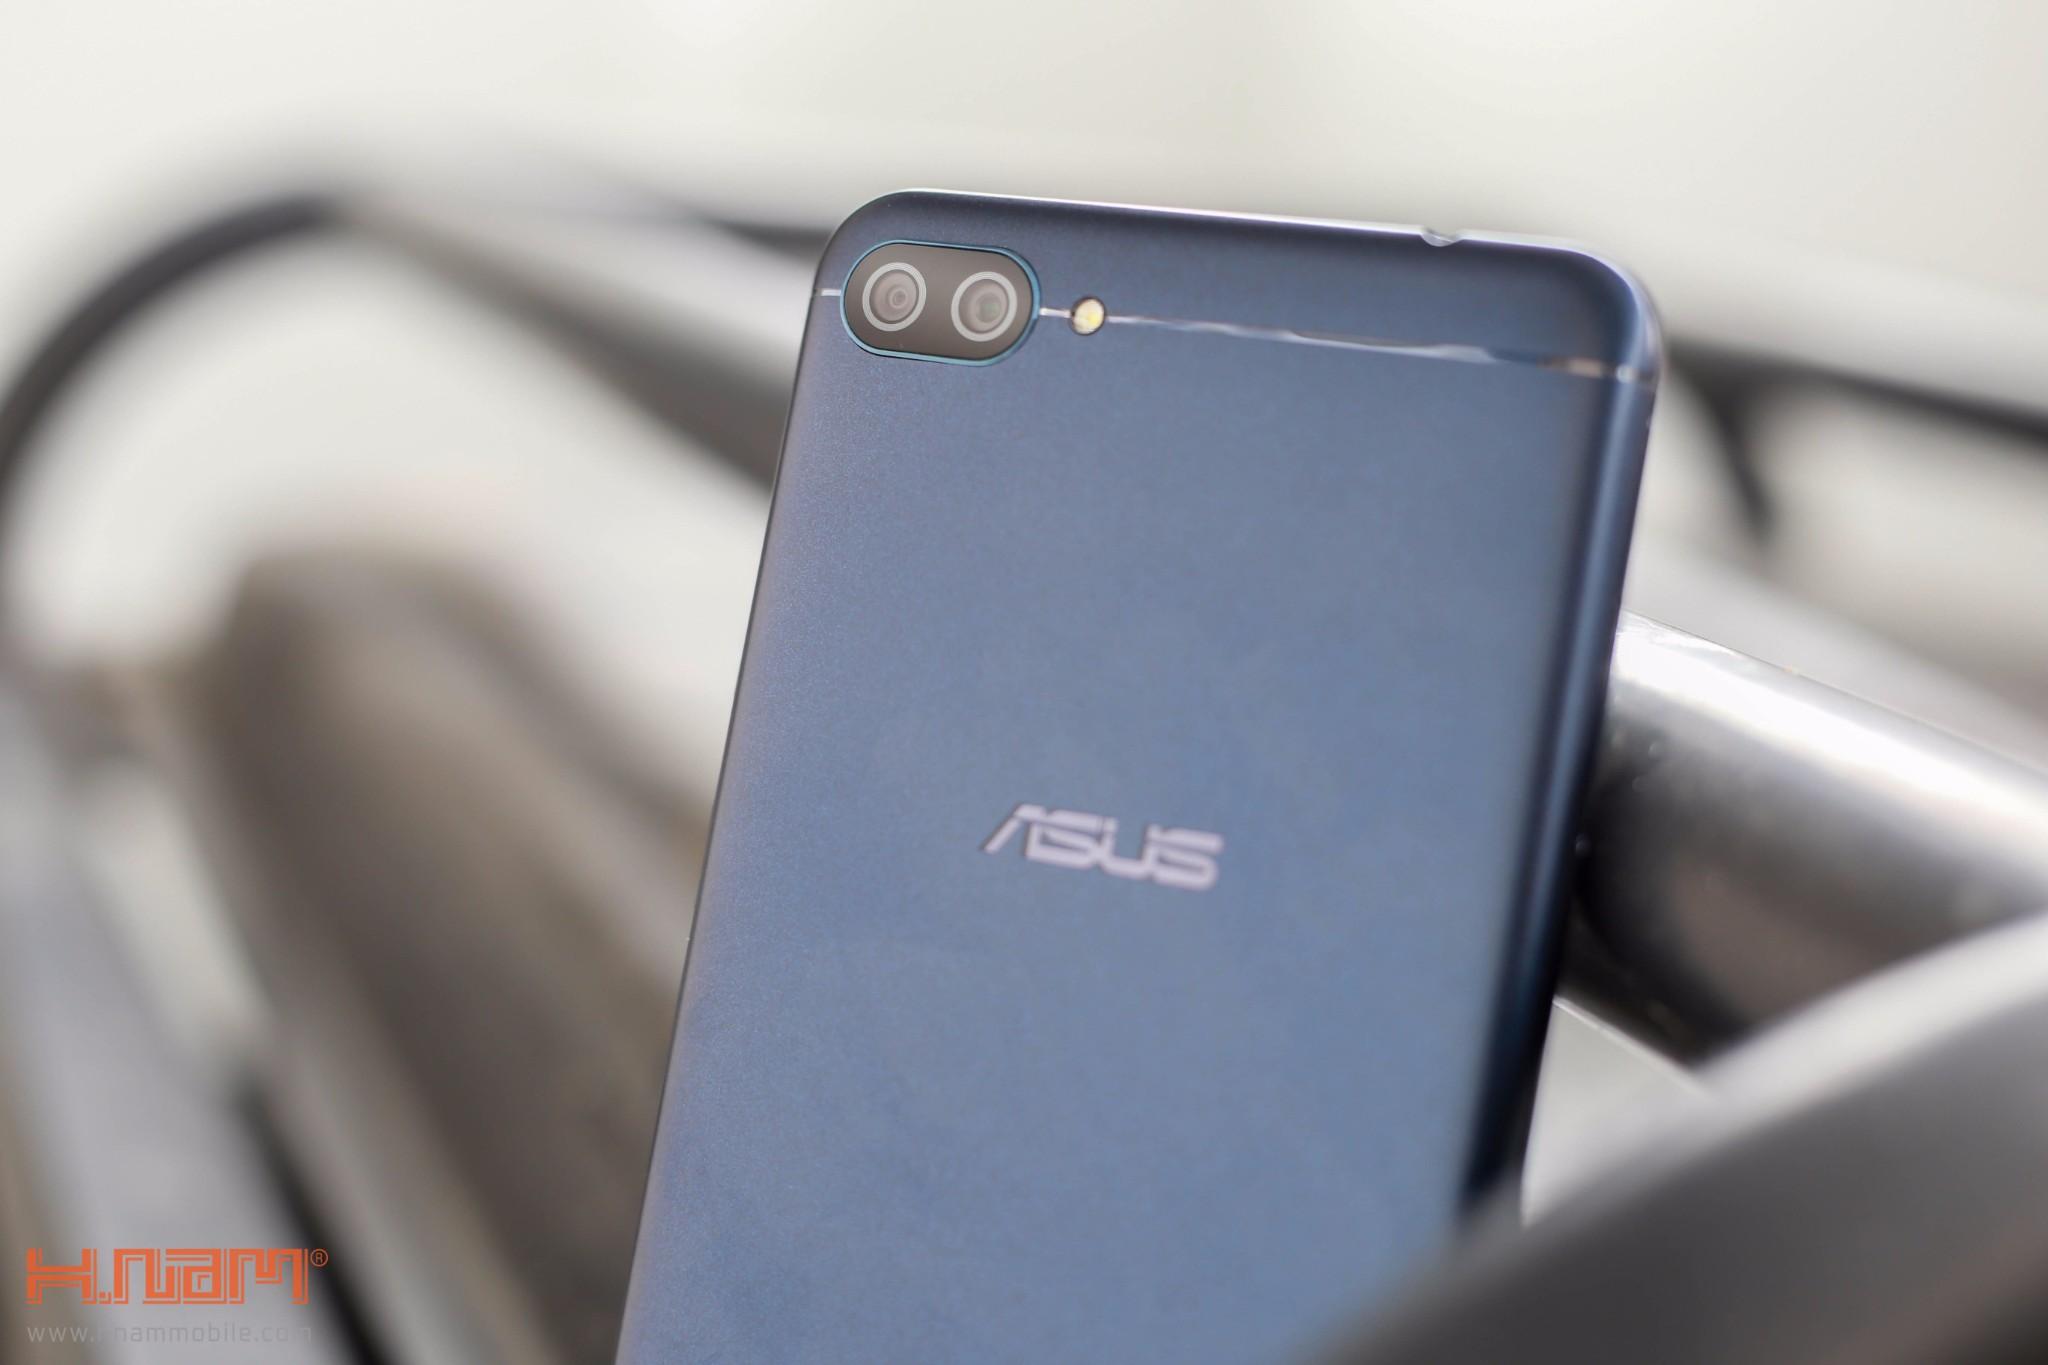 ... Pro · Trên tay ZenFone 4 Max: Tân binh giá 4 triệu có camera kép, pin